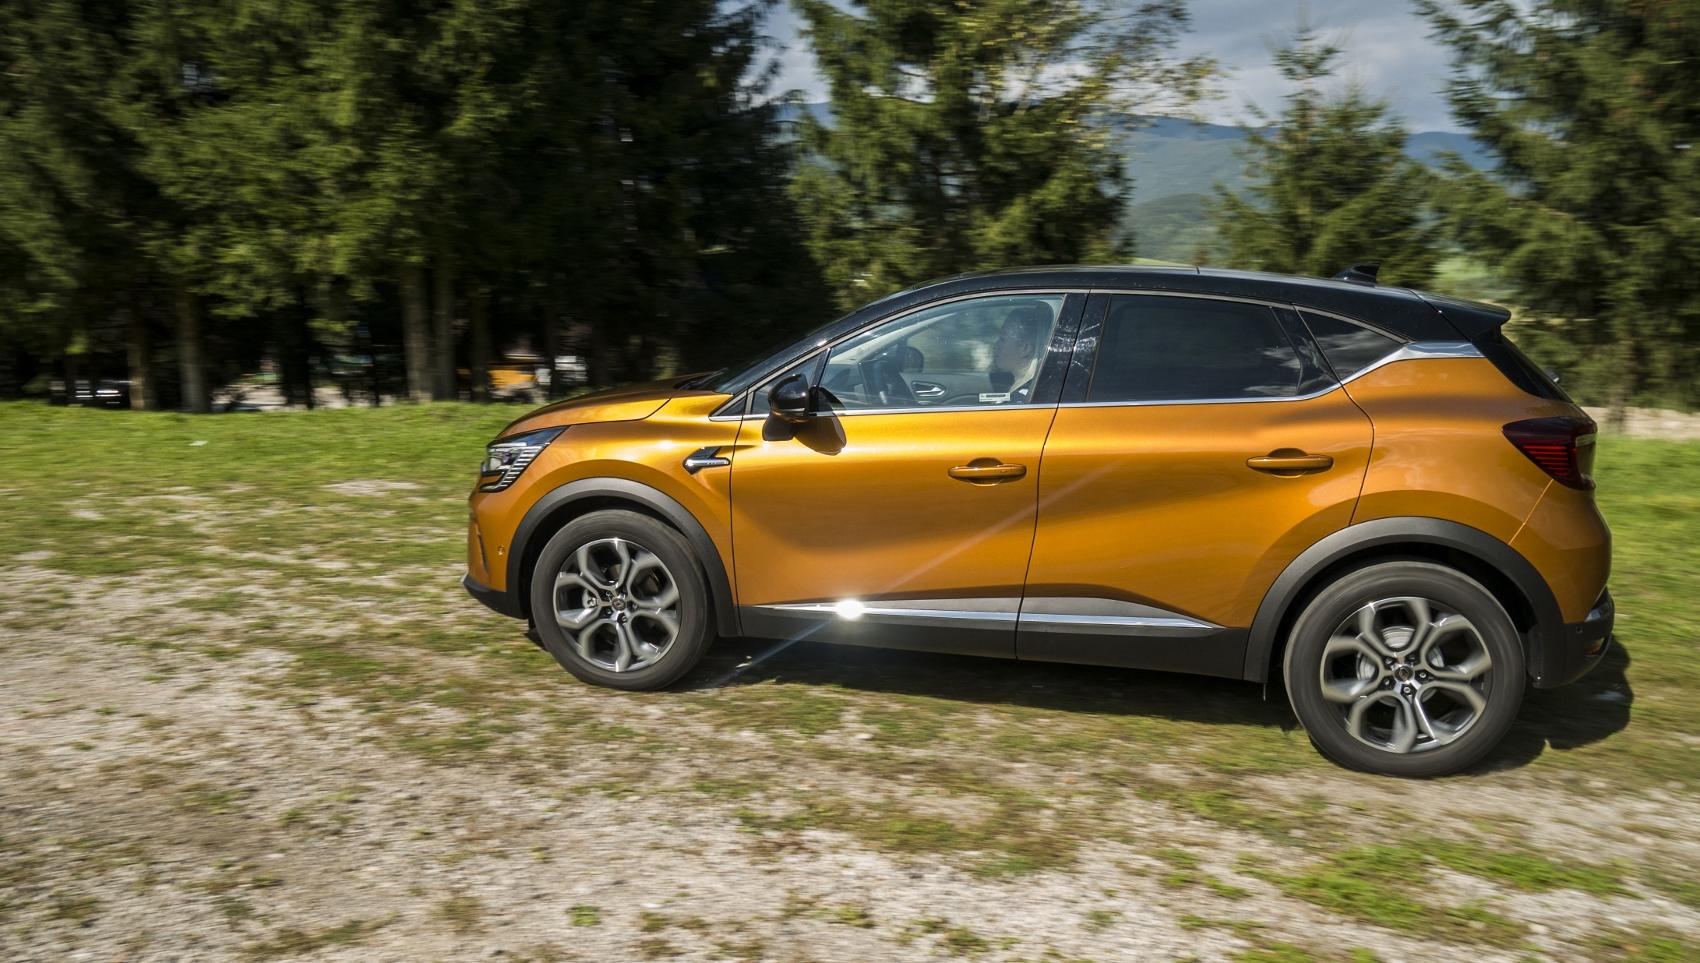 Test: V interiéri sa Renault Captur tvári ako o triedu drahšie auto ZLQahY06L3 renault-captur-12